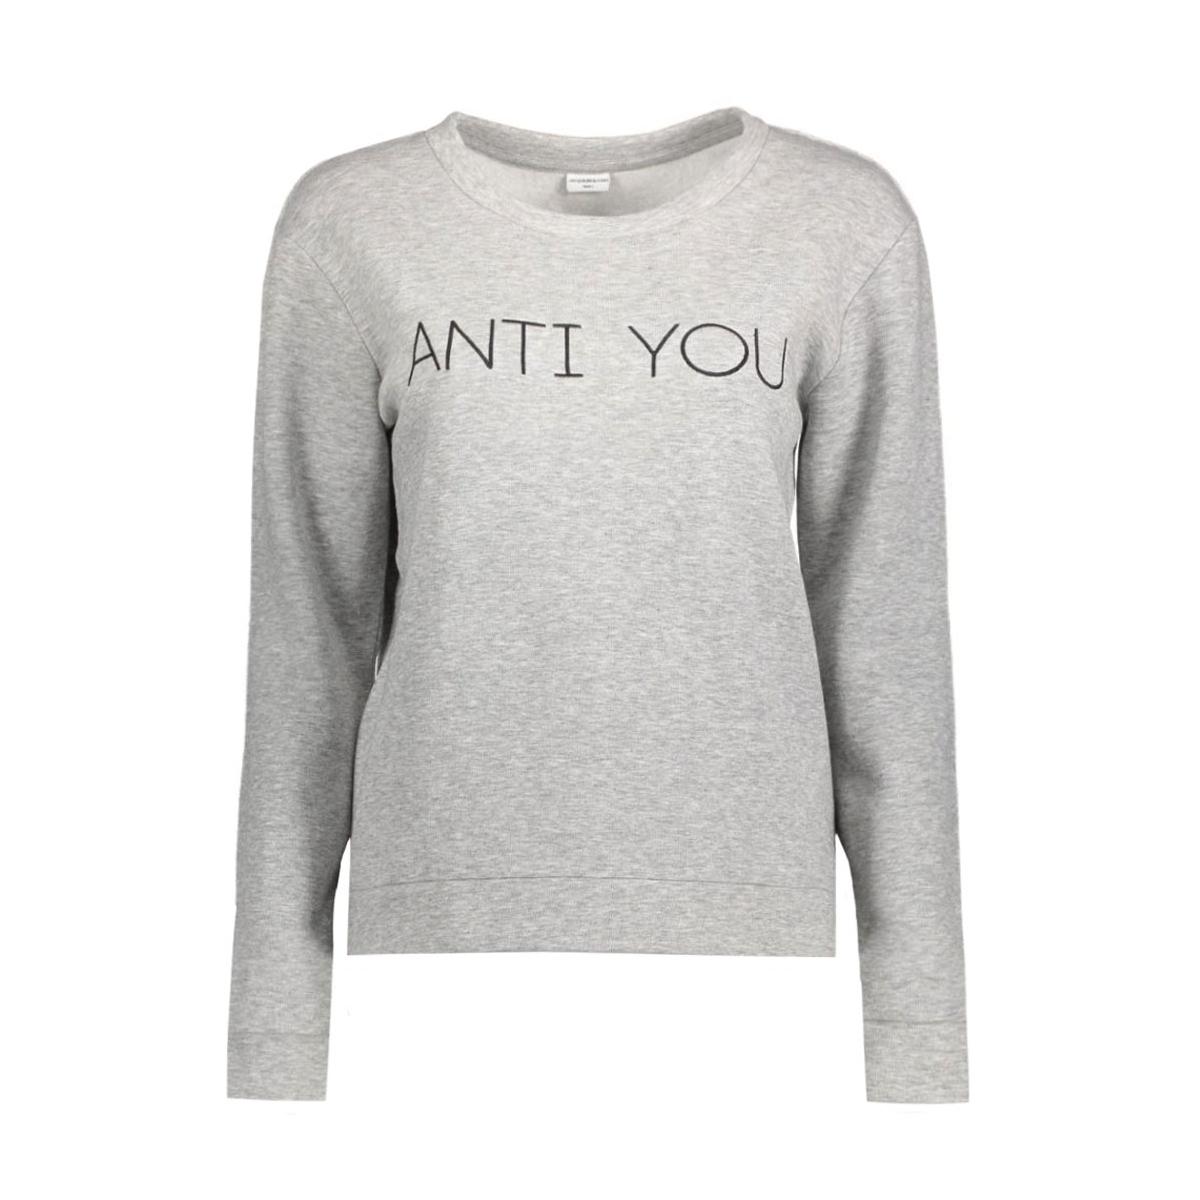 jdytori l/s sweat jrs 15120271 jacqueline de yong sweater light grey melange